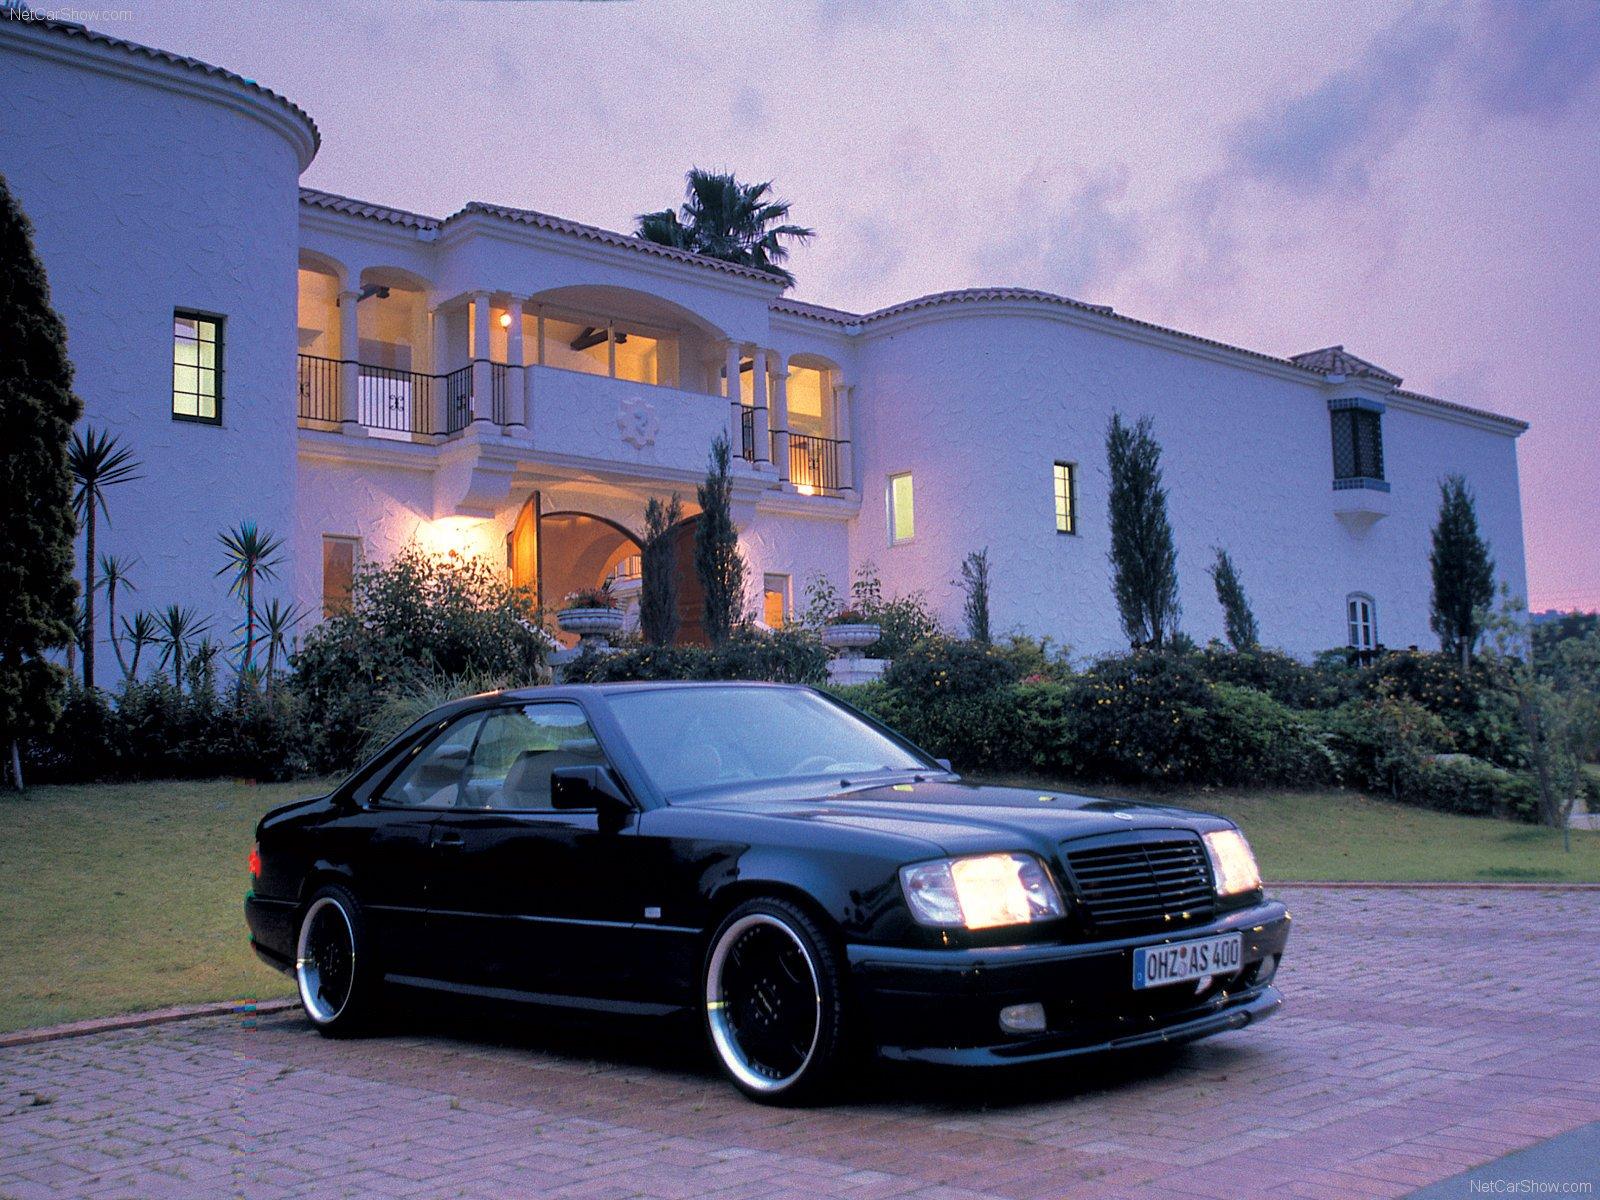 Wald Mercedes Benz W124 Ce 1997 1600x1200 Wallpaper 04